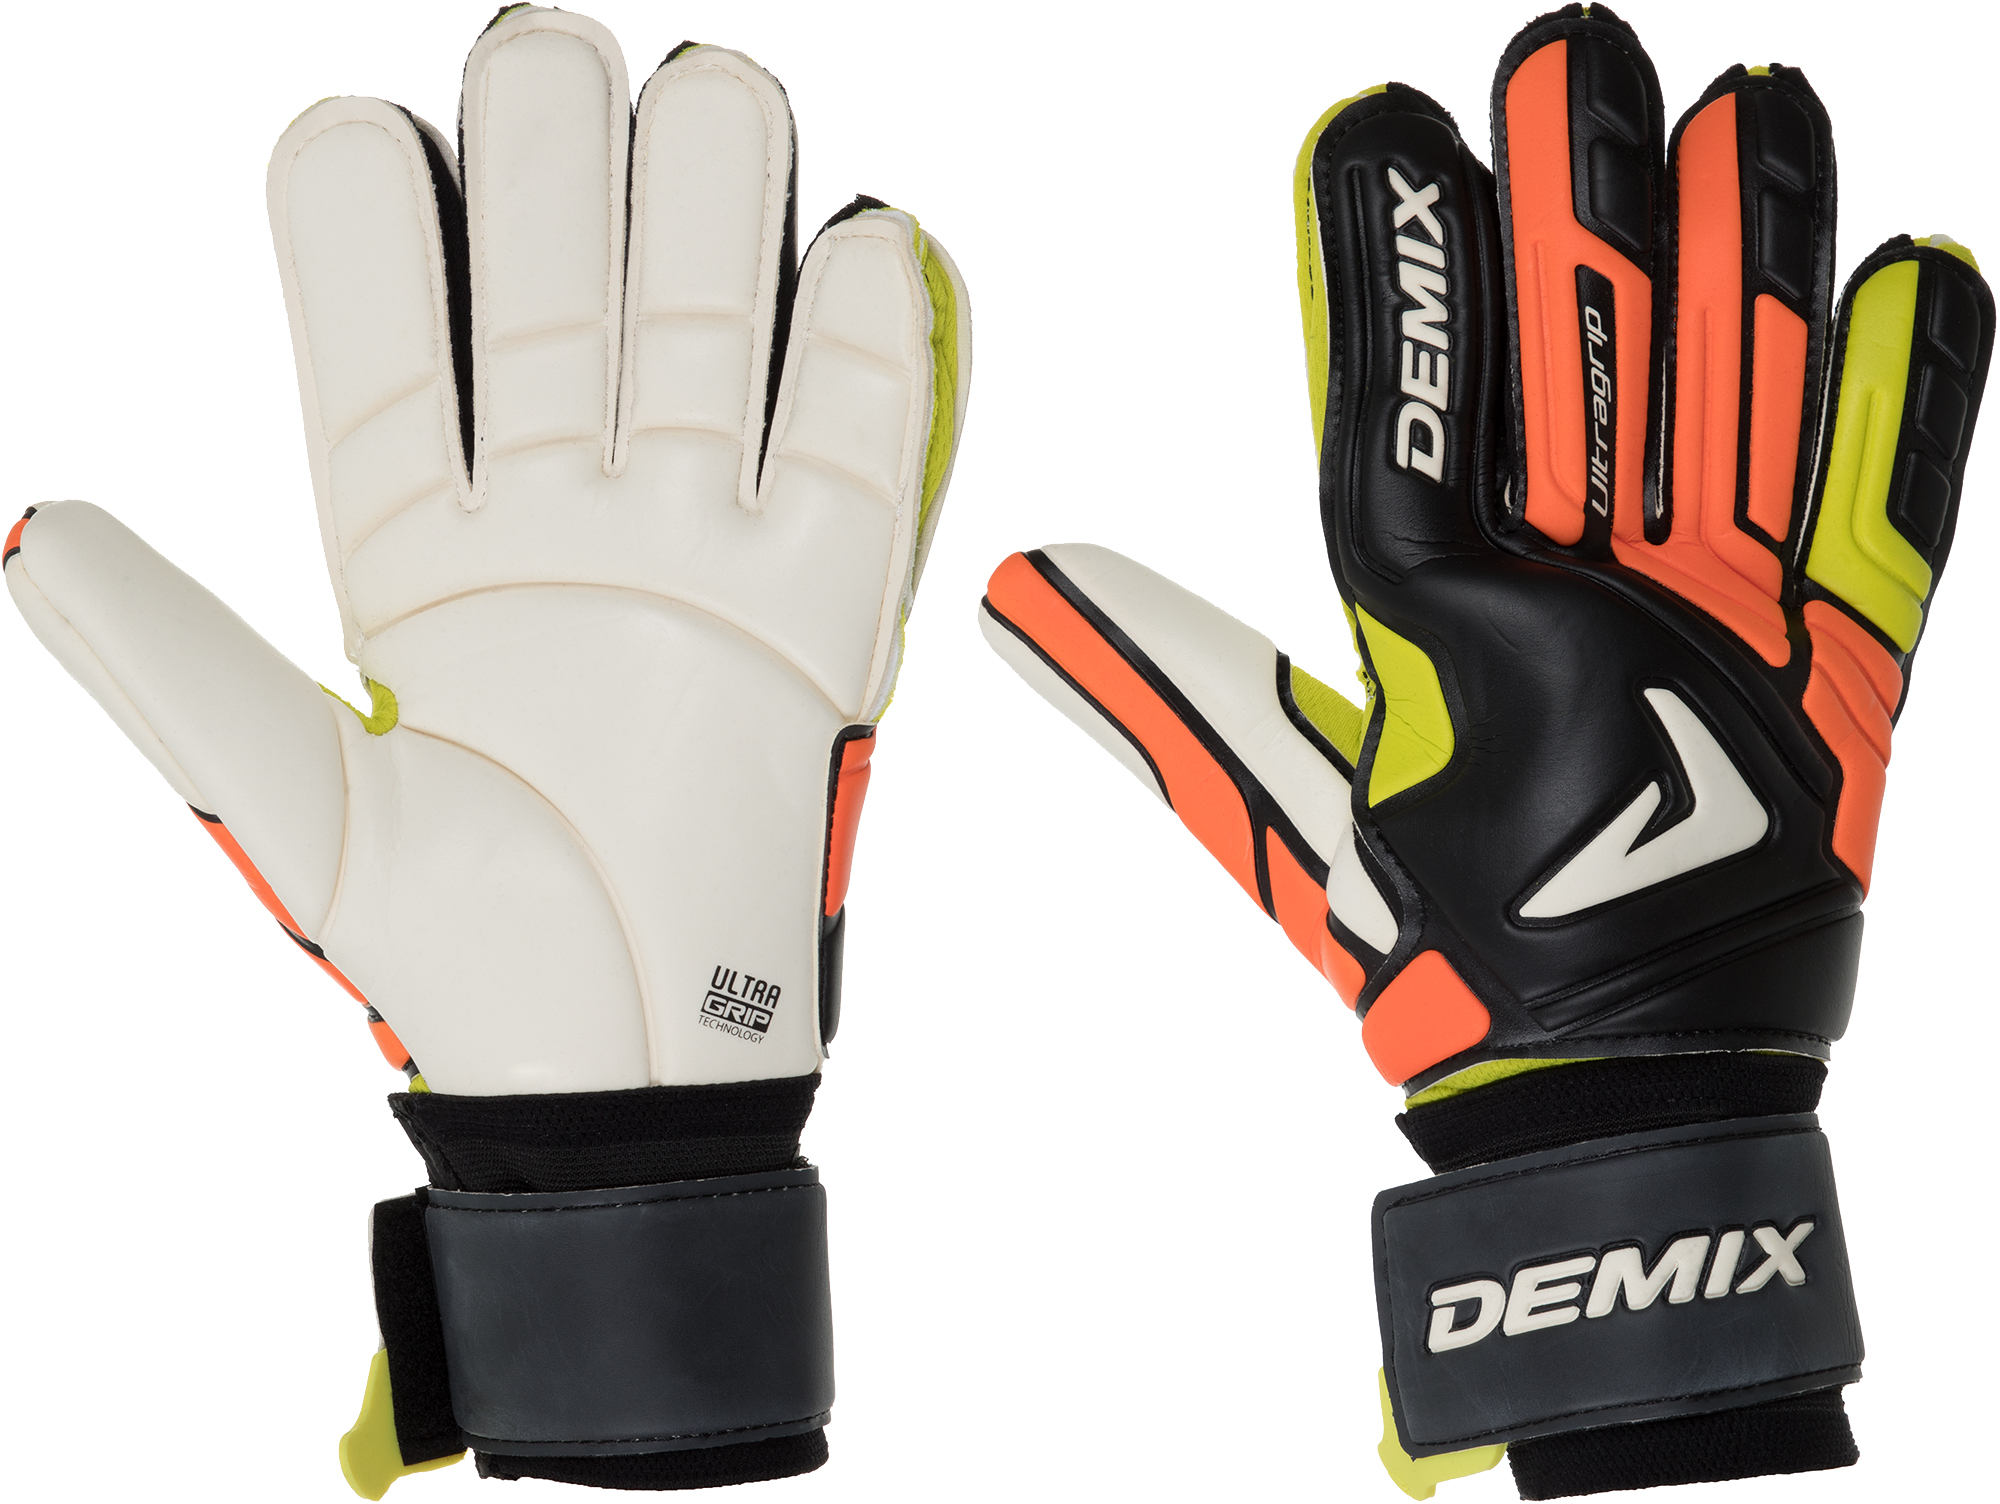 Demix Перчатки вратарские Demix, размер 11 цена